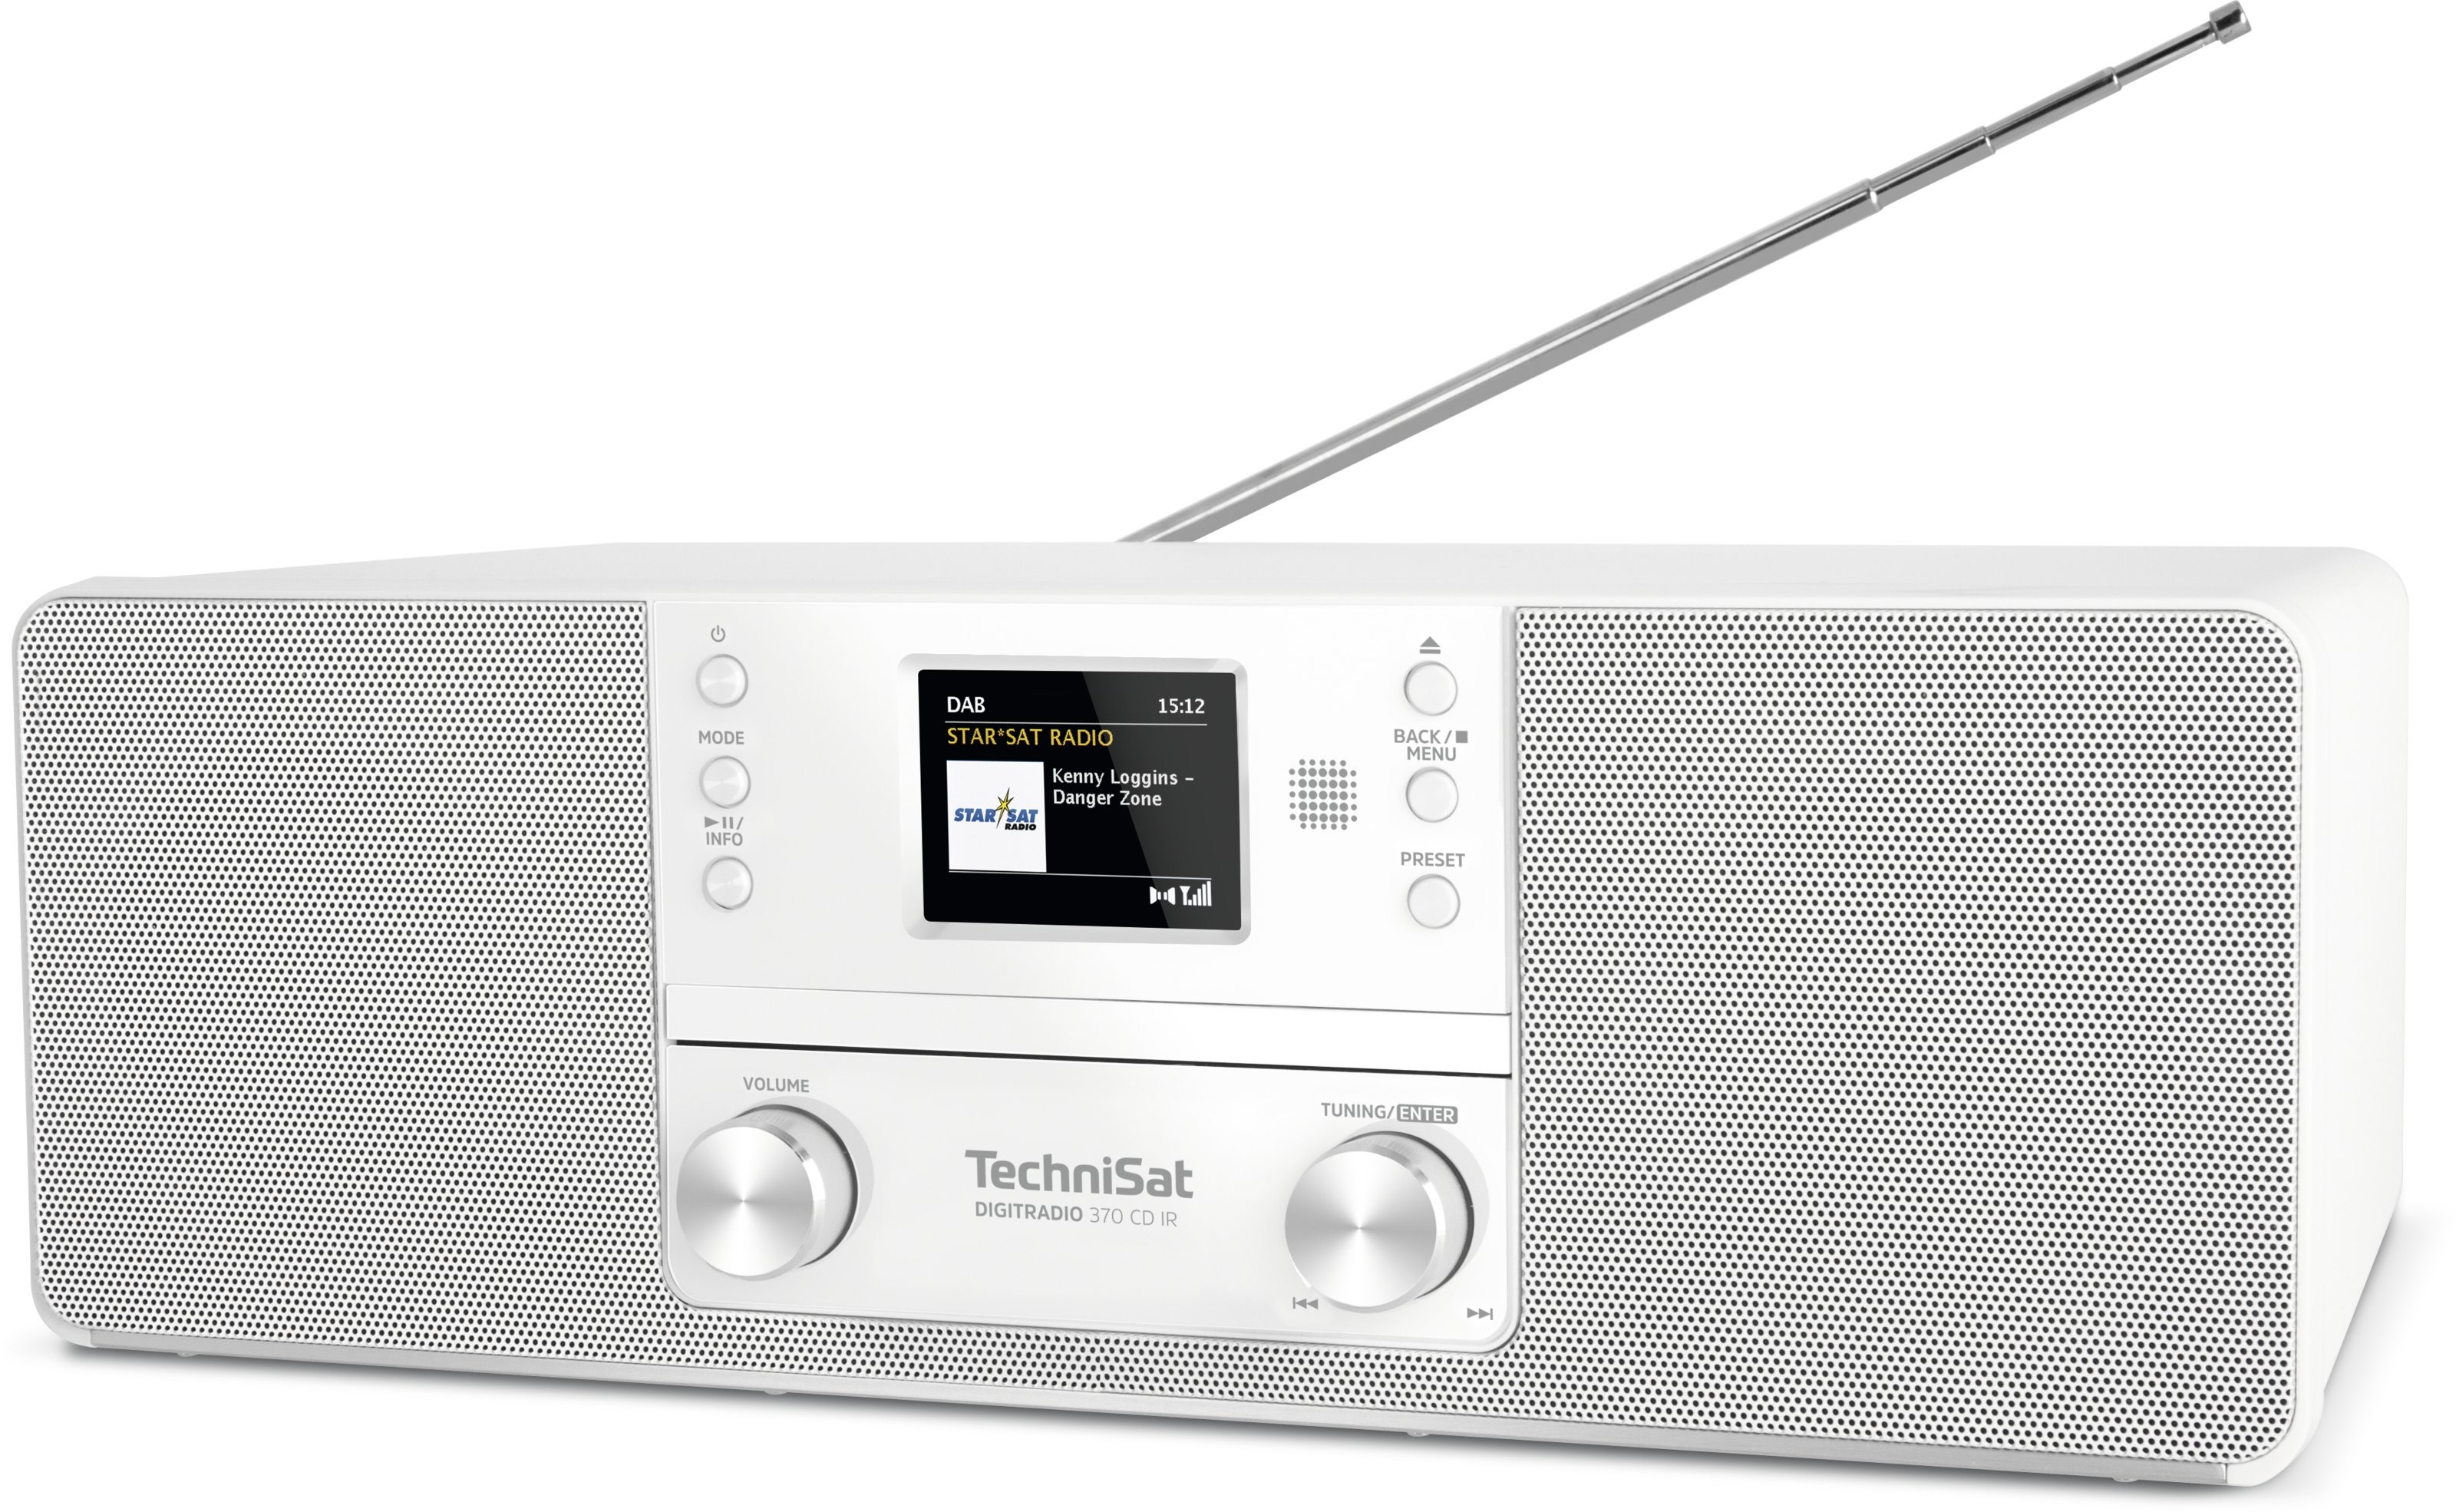 Foto van TechniSat Digitradio 370 CD IR DAB radio